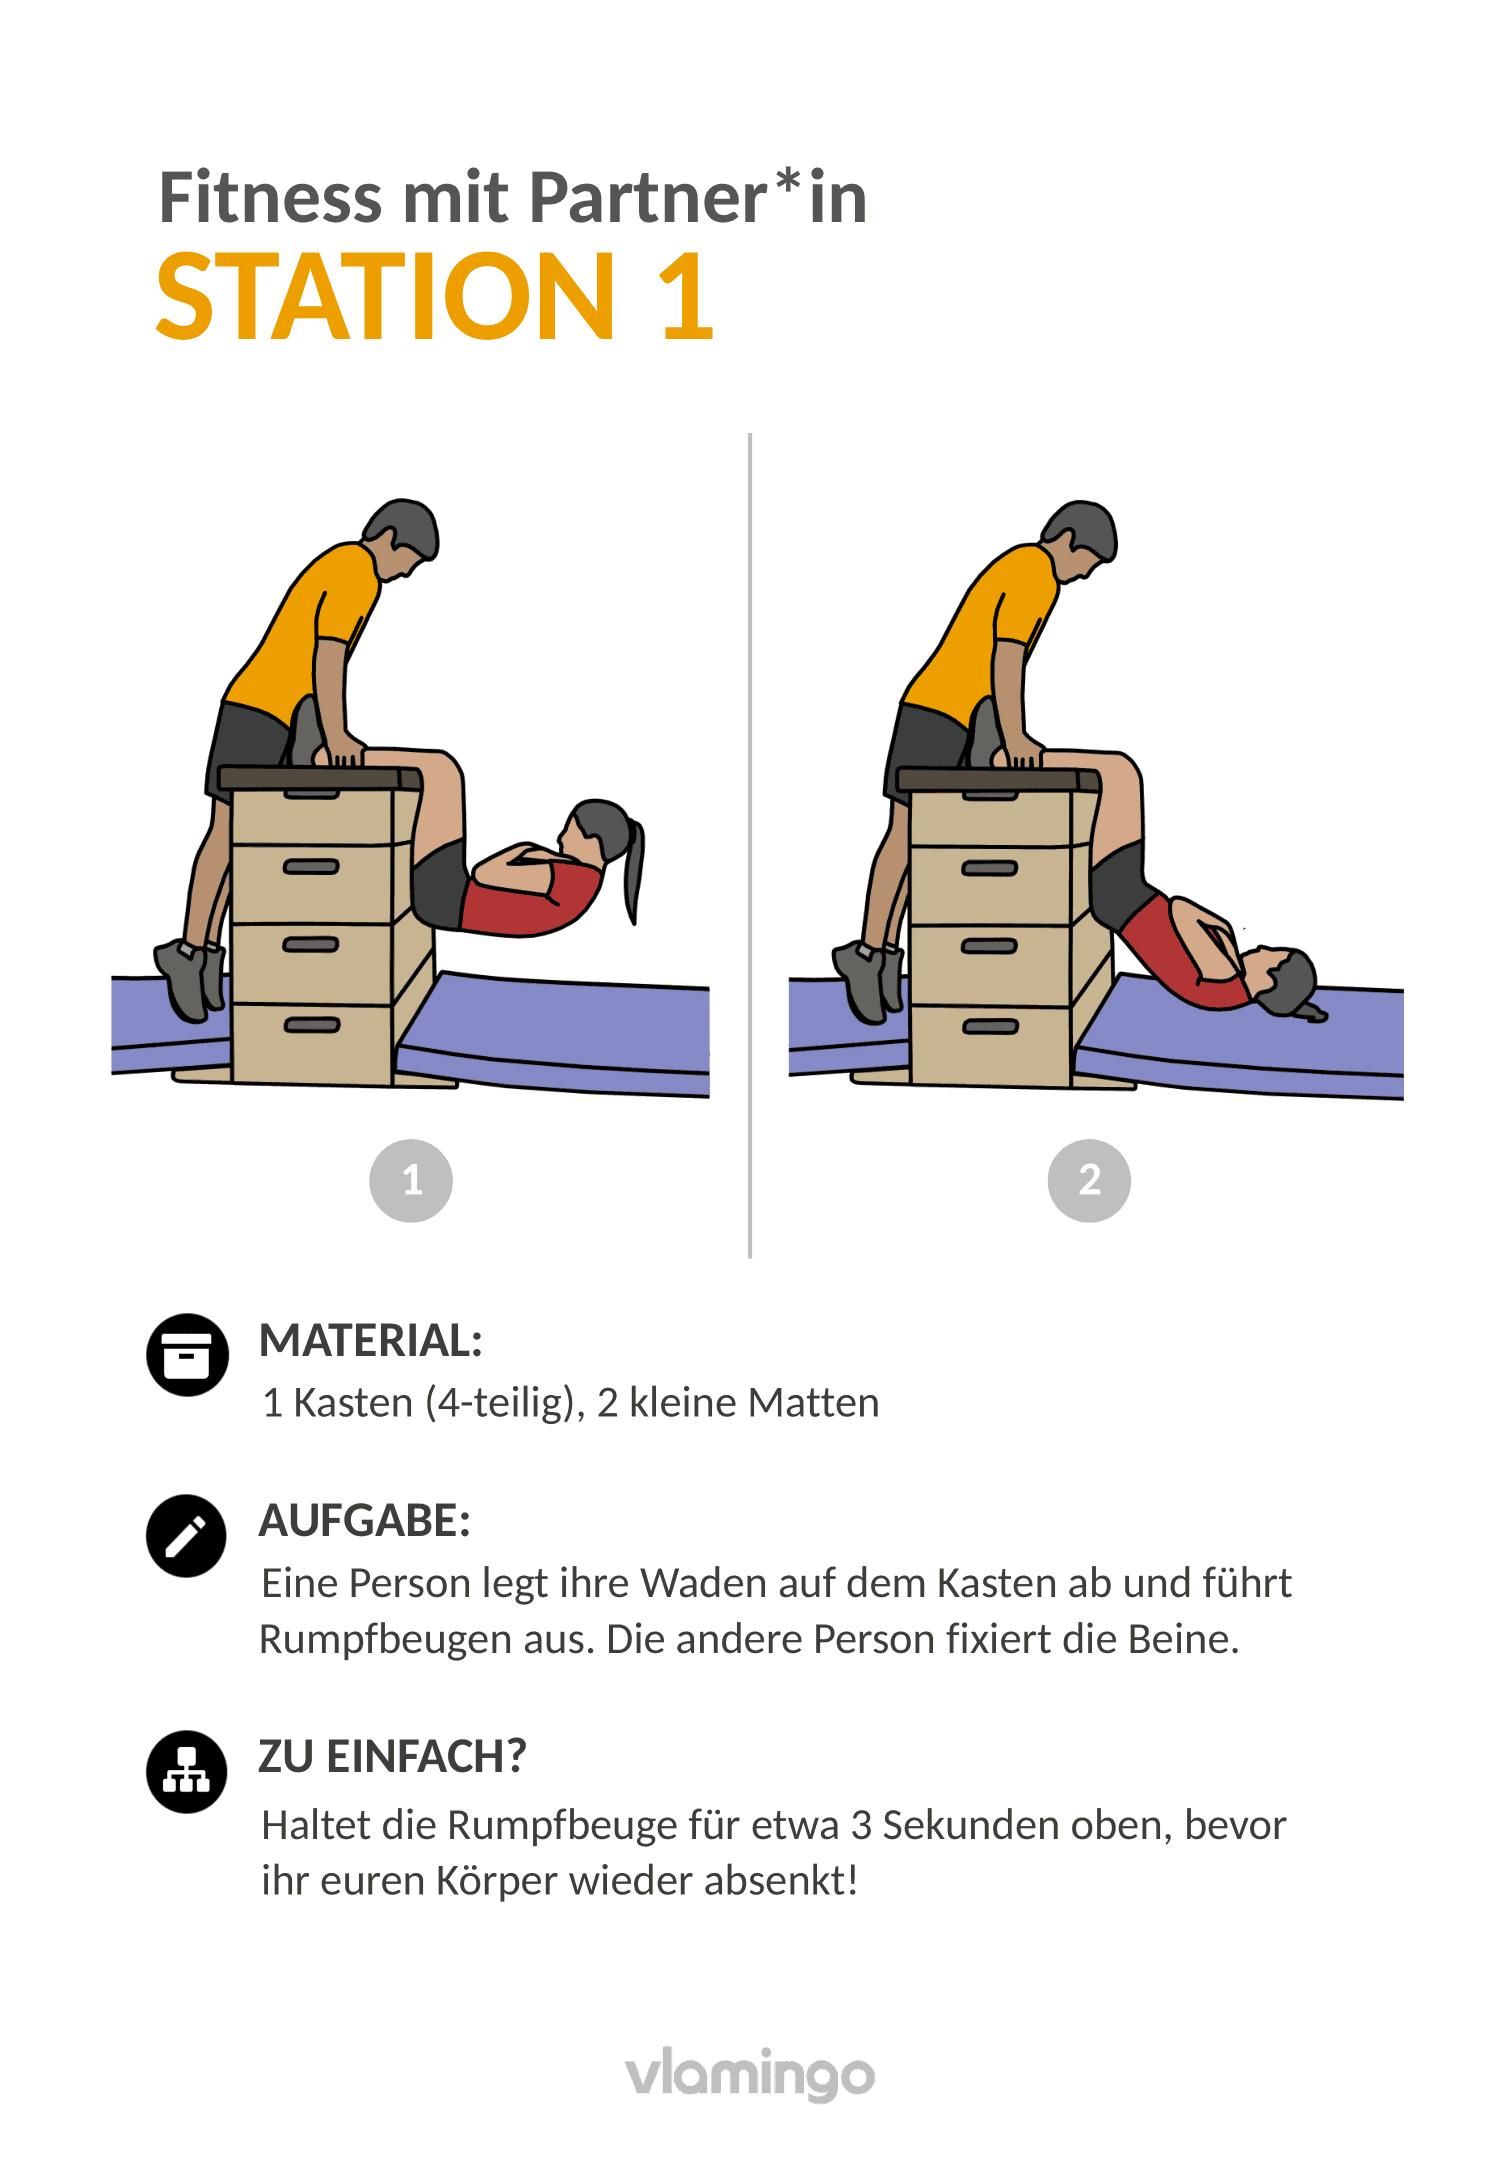 Fitness mit Partner - Übung 1